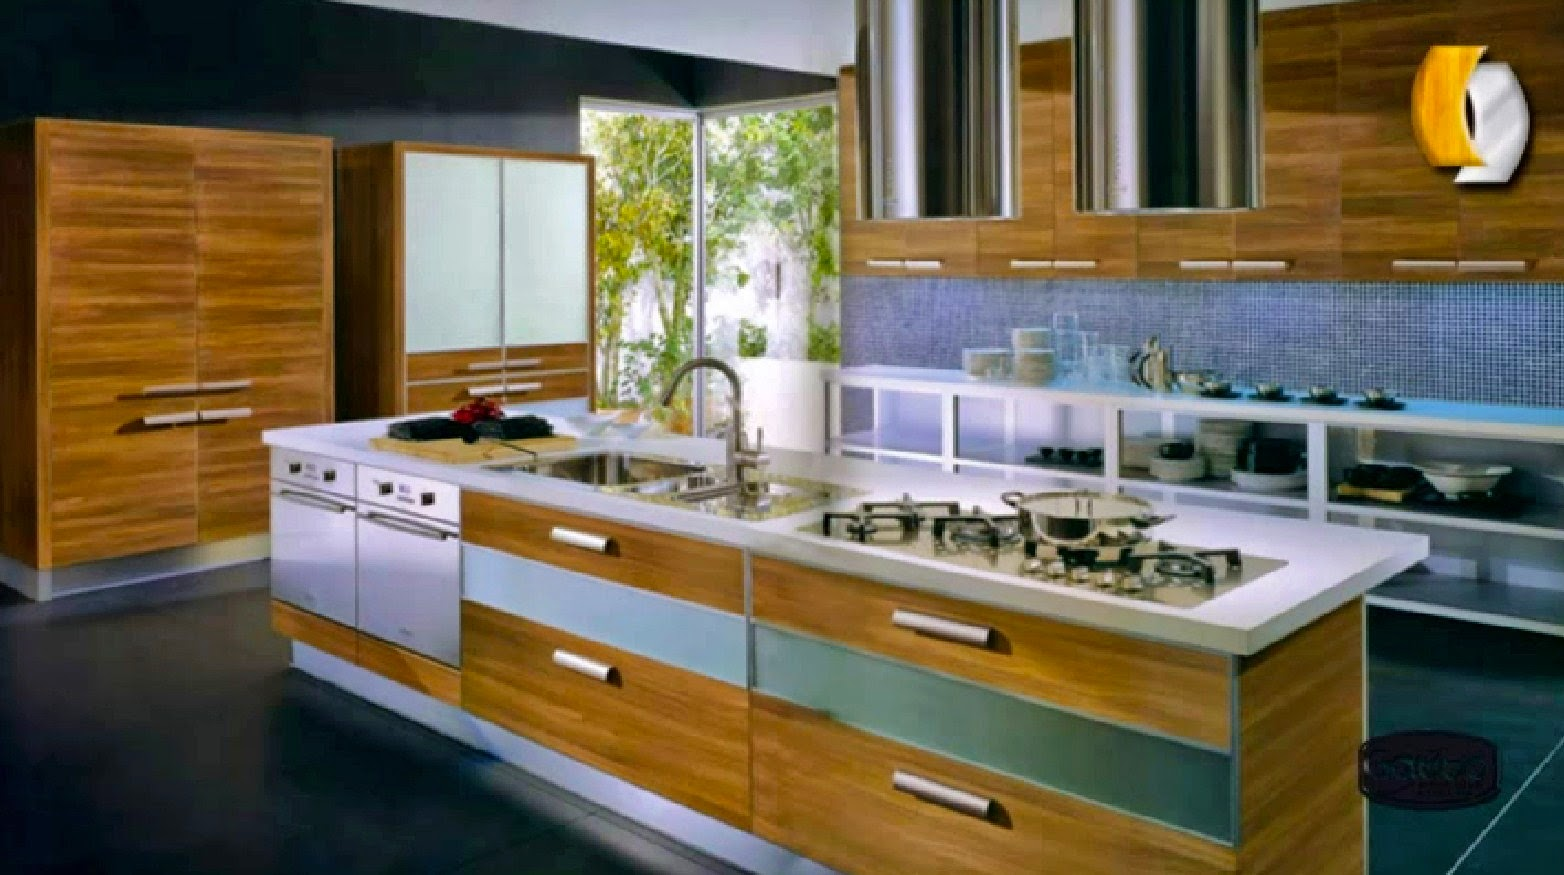 Blog de cristal y menaje online for Menaje cocina online